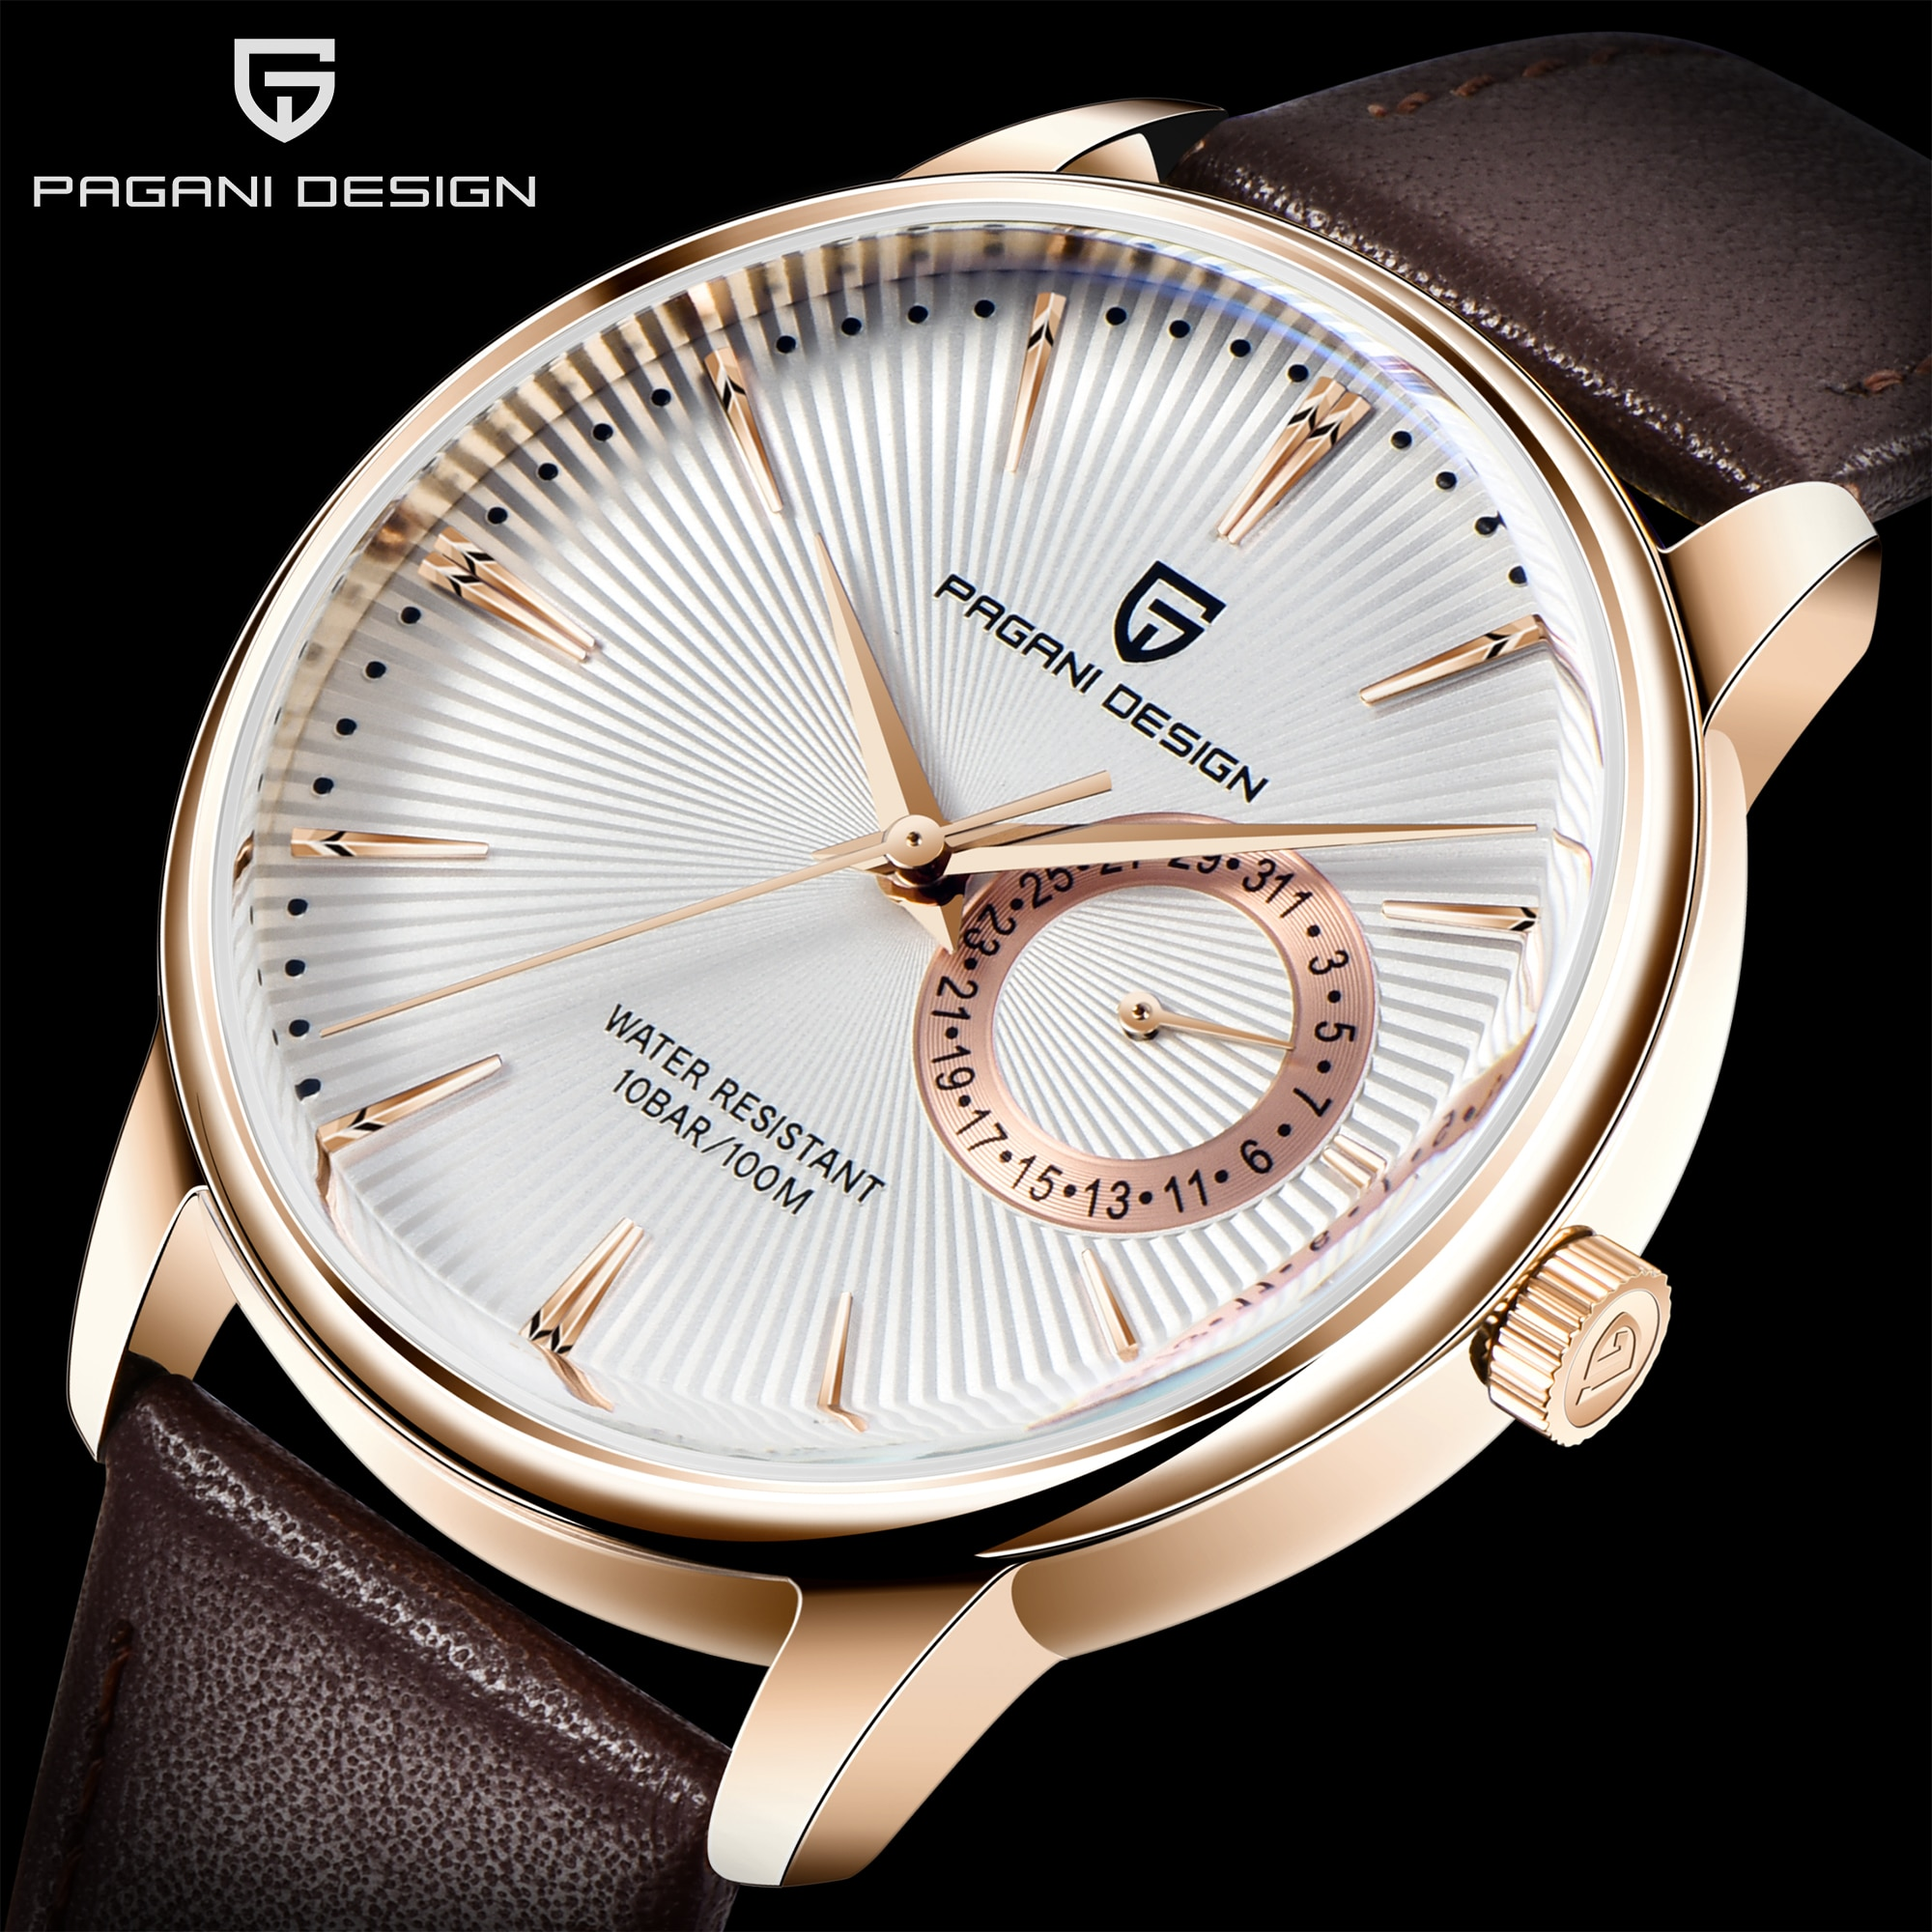 2020 PAGANI DESIGN Watches Men Luxury Brand Quartz Men Chronograph Sport Waterproof Casual Business Watch Relogio Masculino+Box